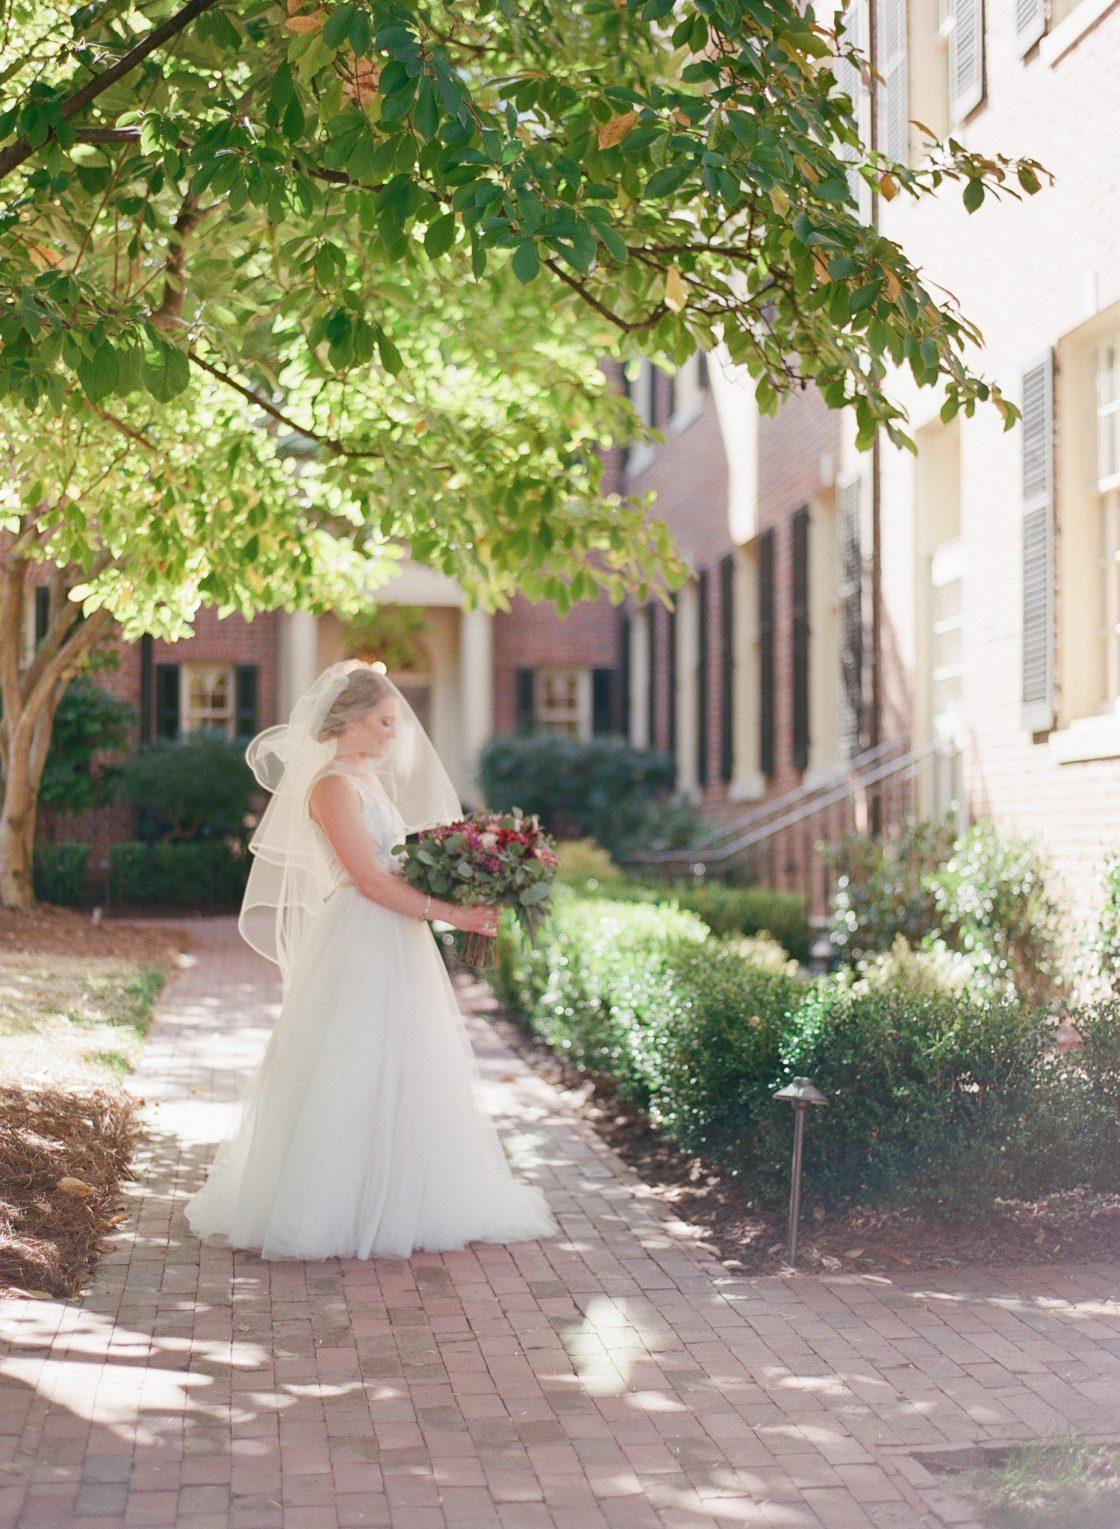 Classic Romantic Bride Wedding Photo